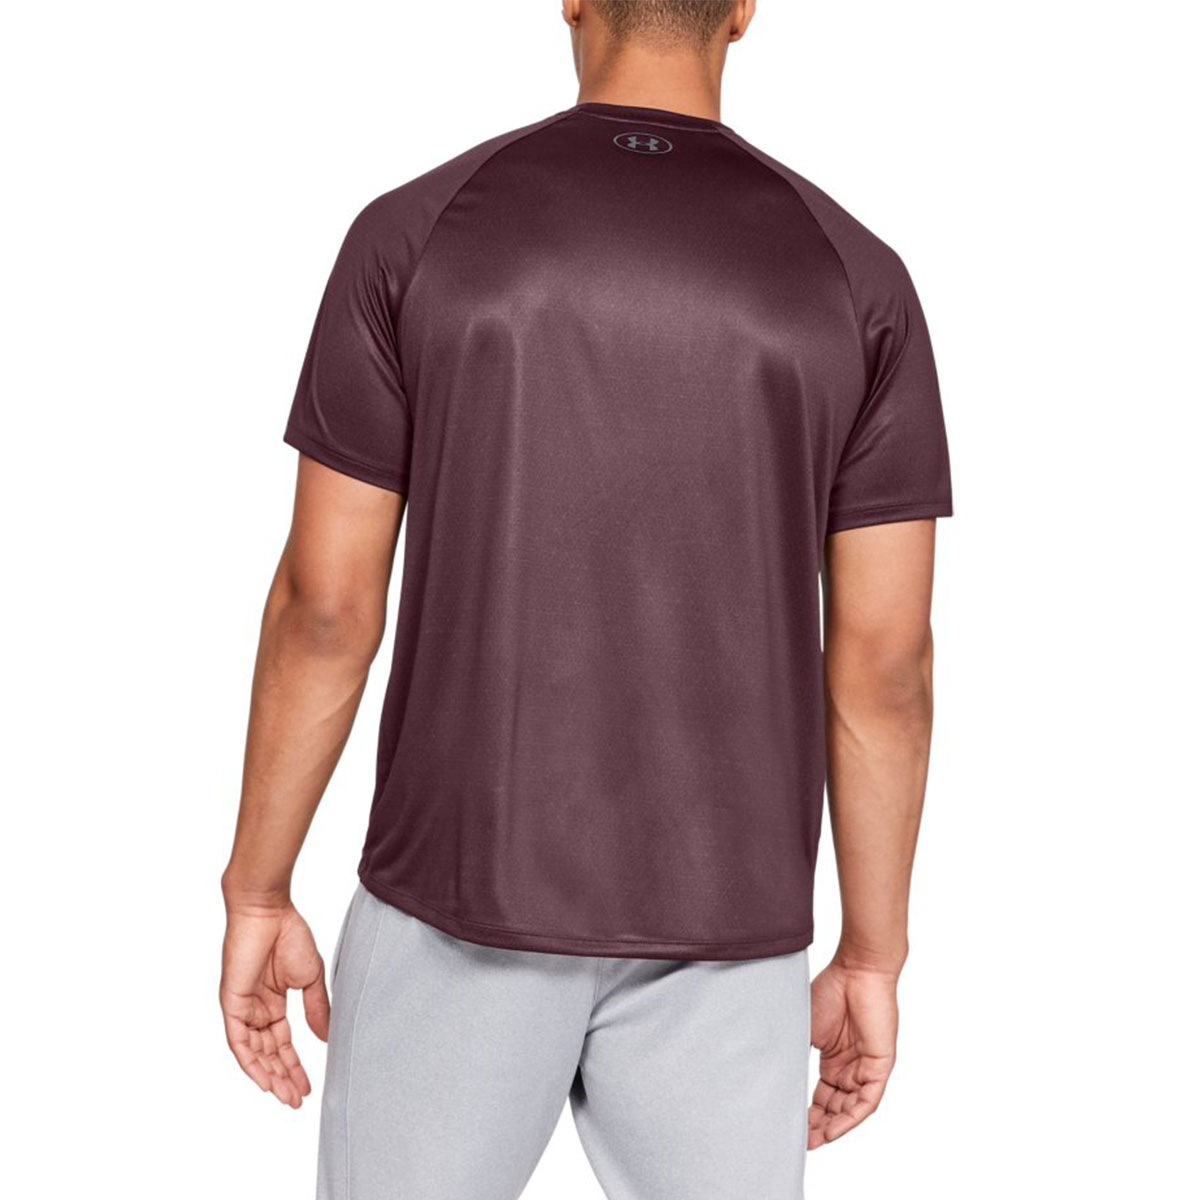 Under-Armour-Mens-UA-Tech-SS-Printed-Moisture-Wicking-T-Shirt-Tee-27-OFF-RRP thumbnail 7